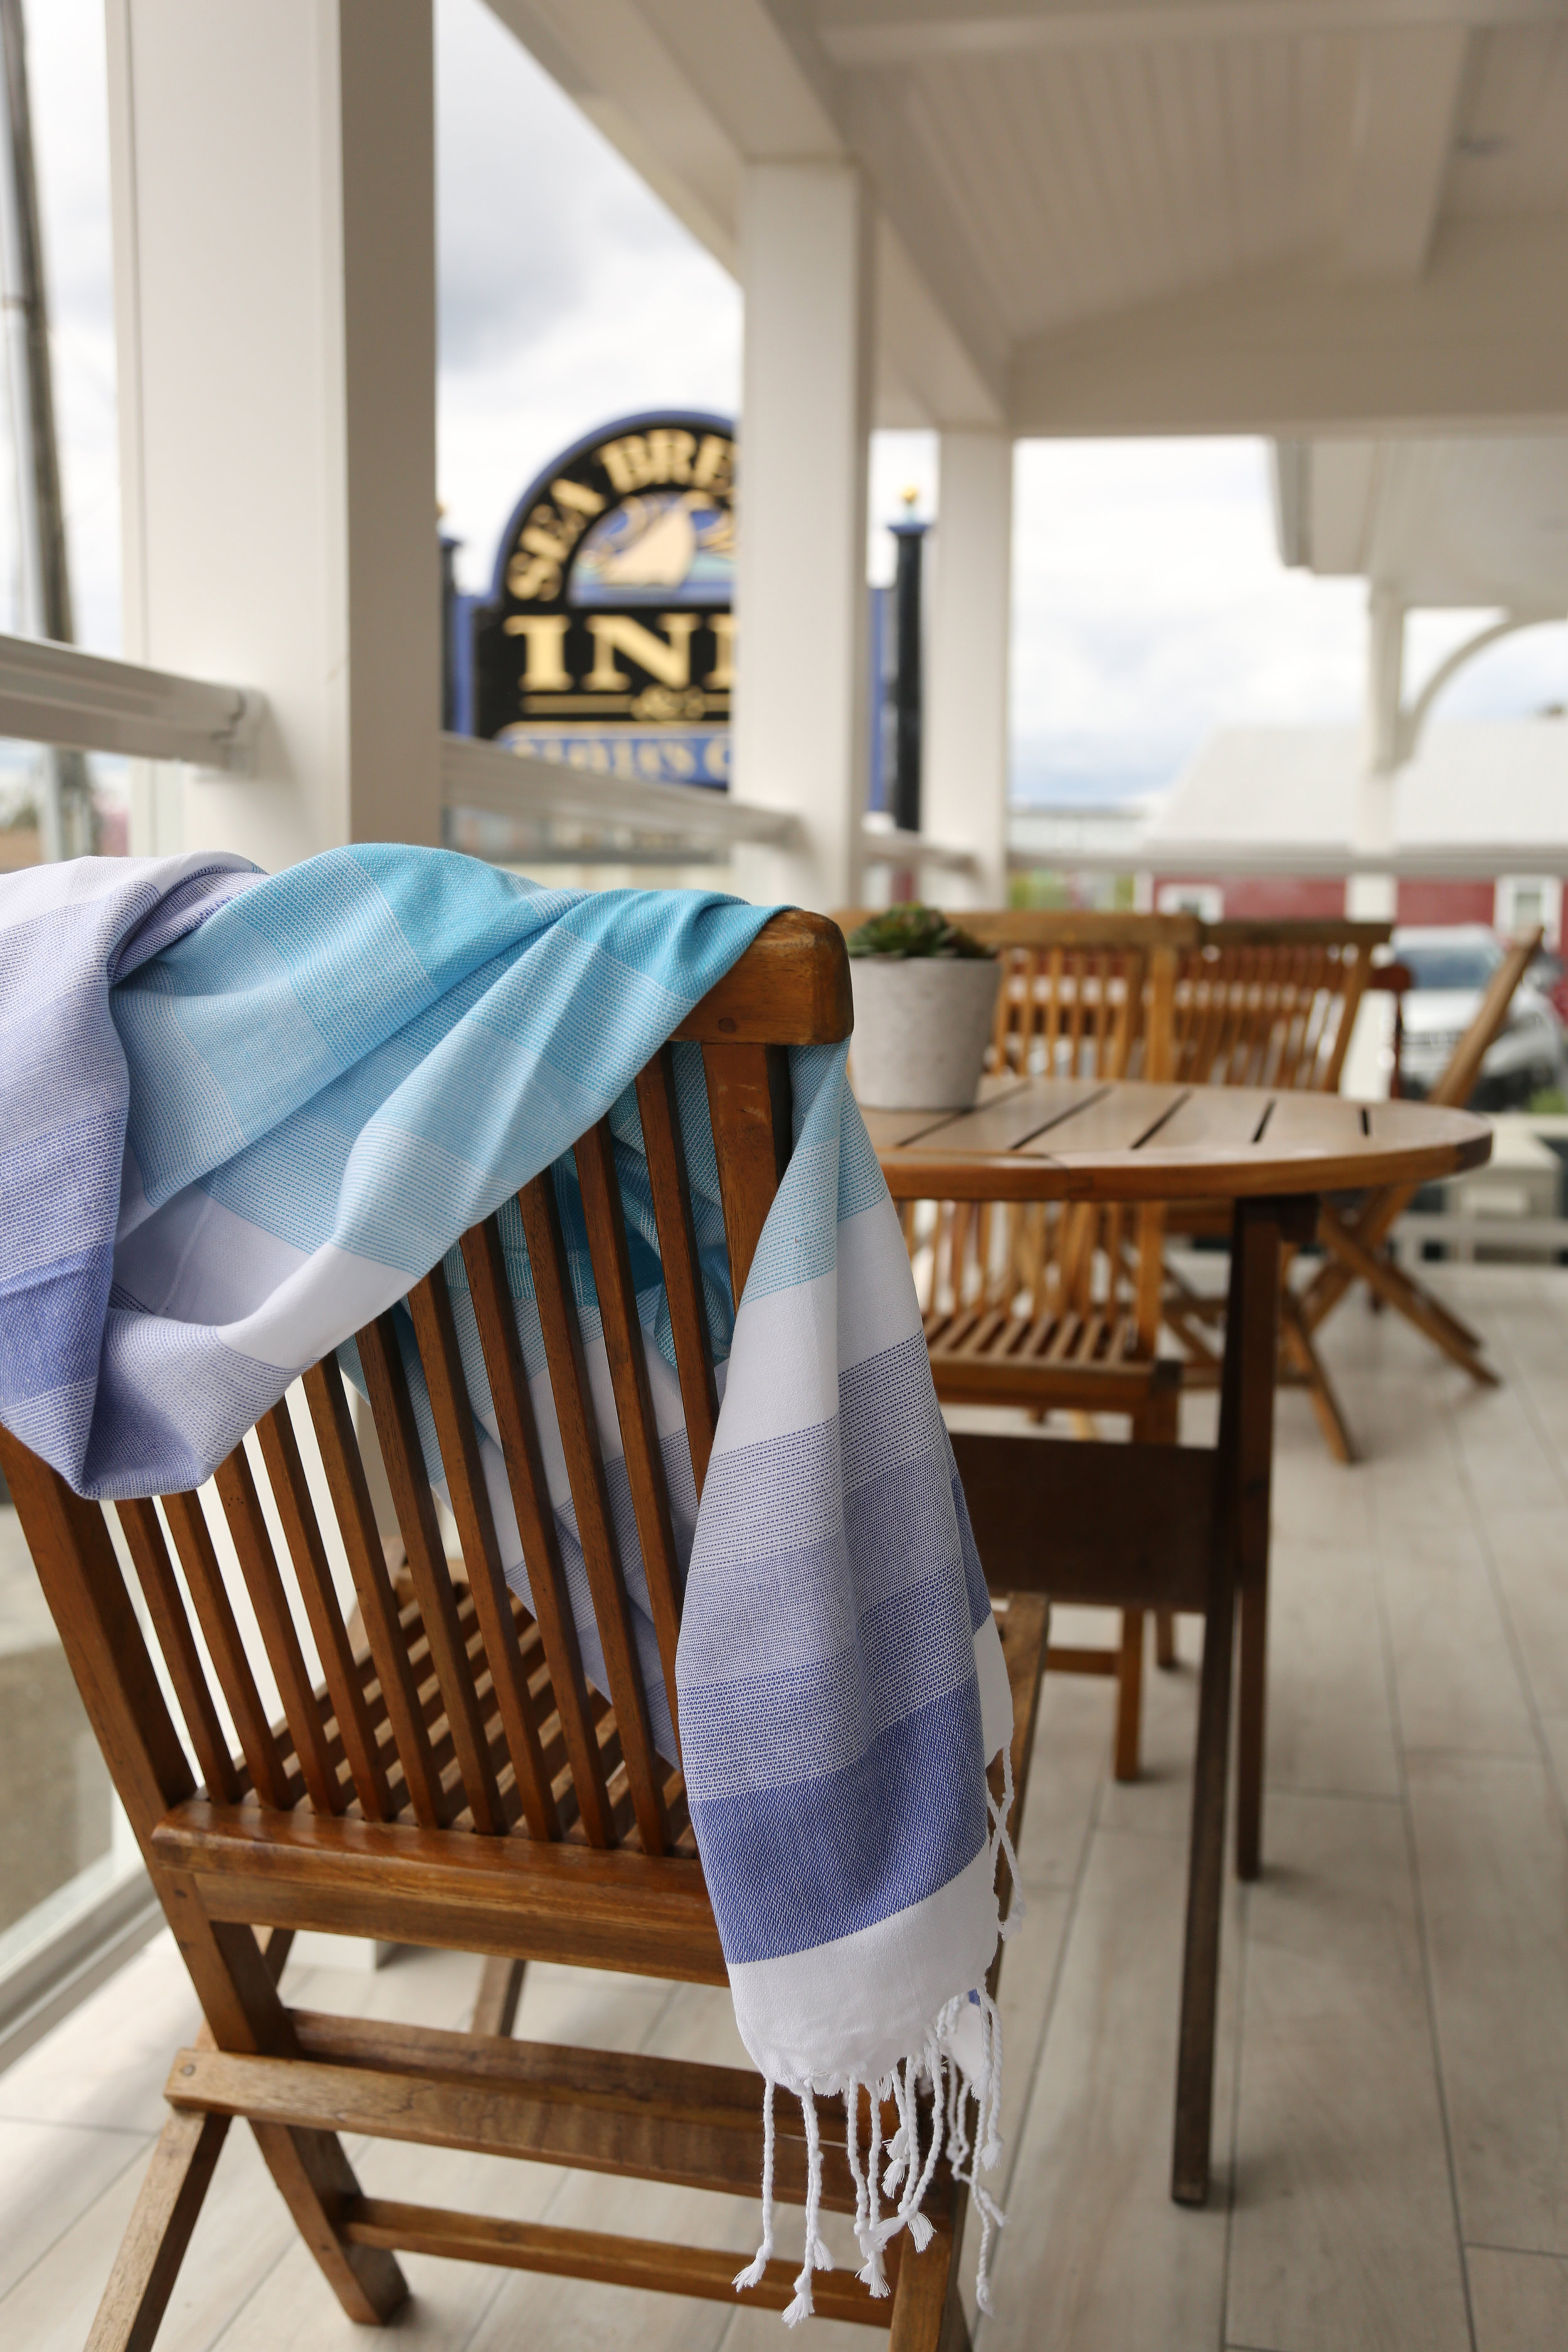 Sea Breeze Inn (242 of 292) copy 2.jpg